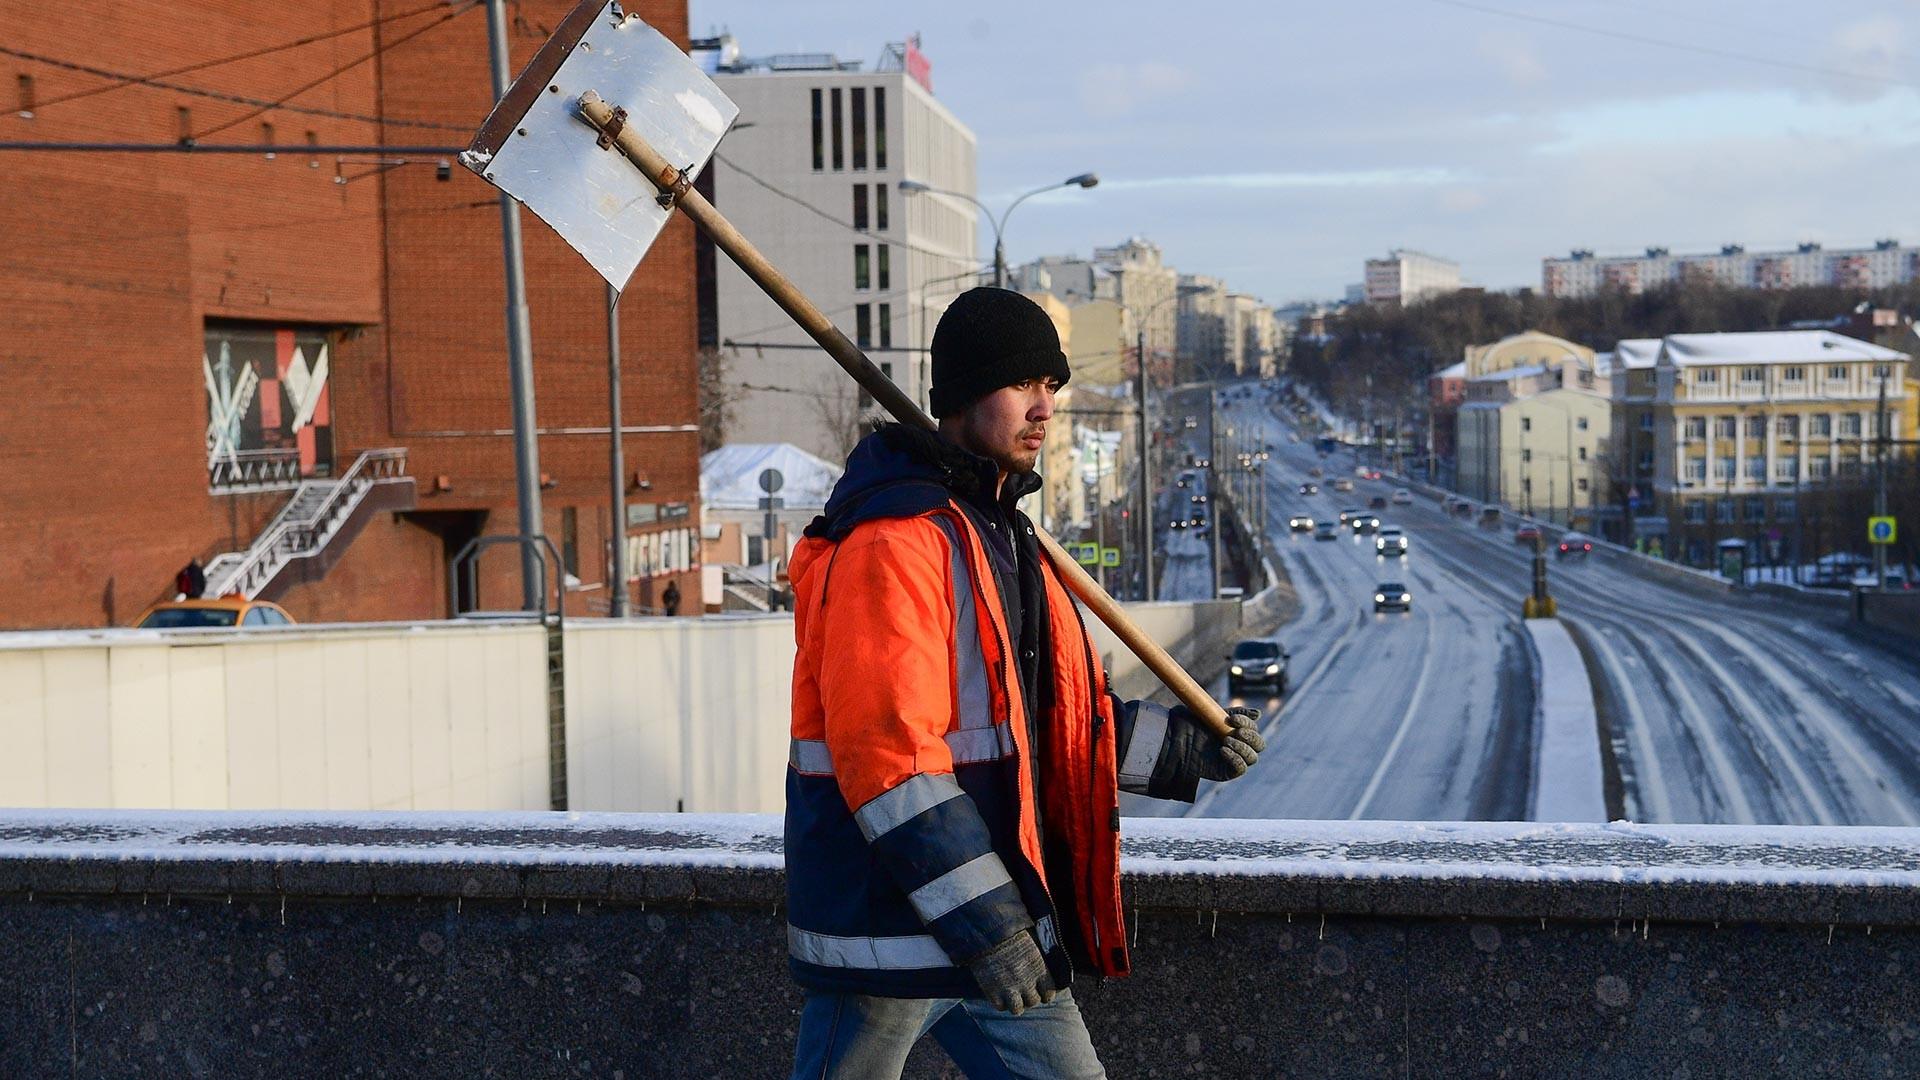 TKA sektor layanan prasarana dan sarana umum melintas di Jalan Zemlyanoy val, Moskow.